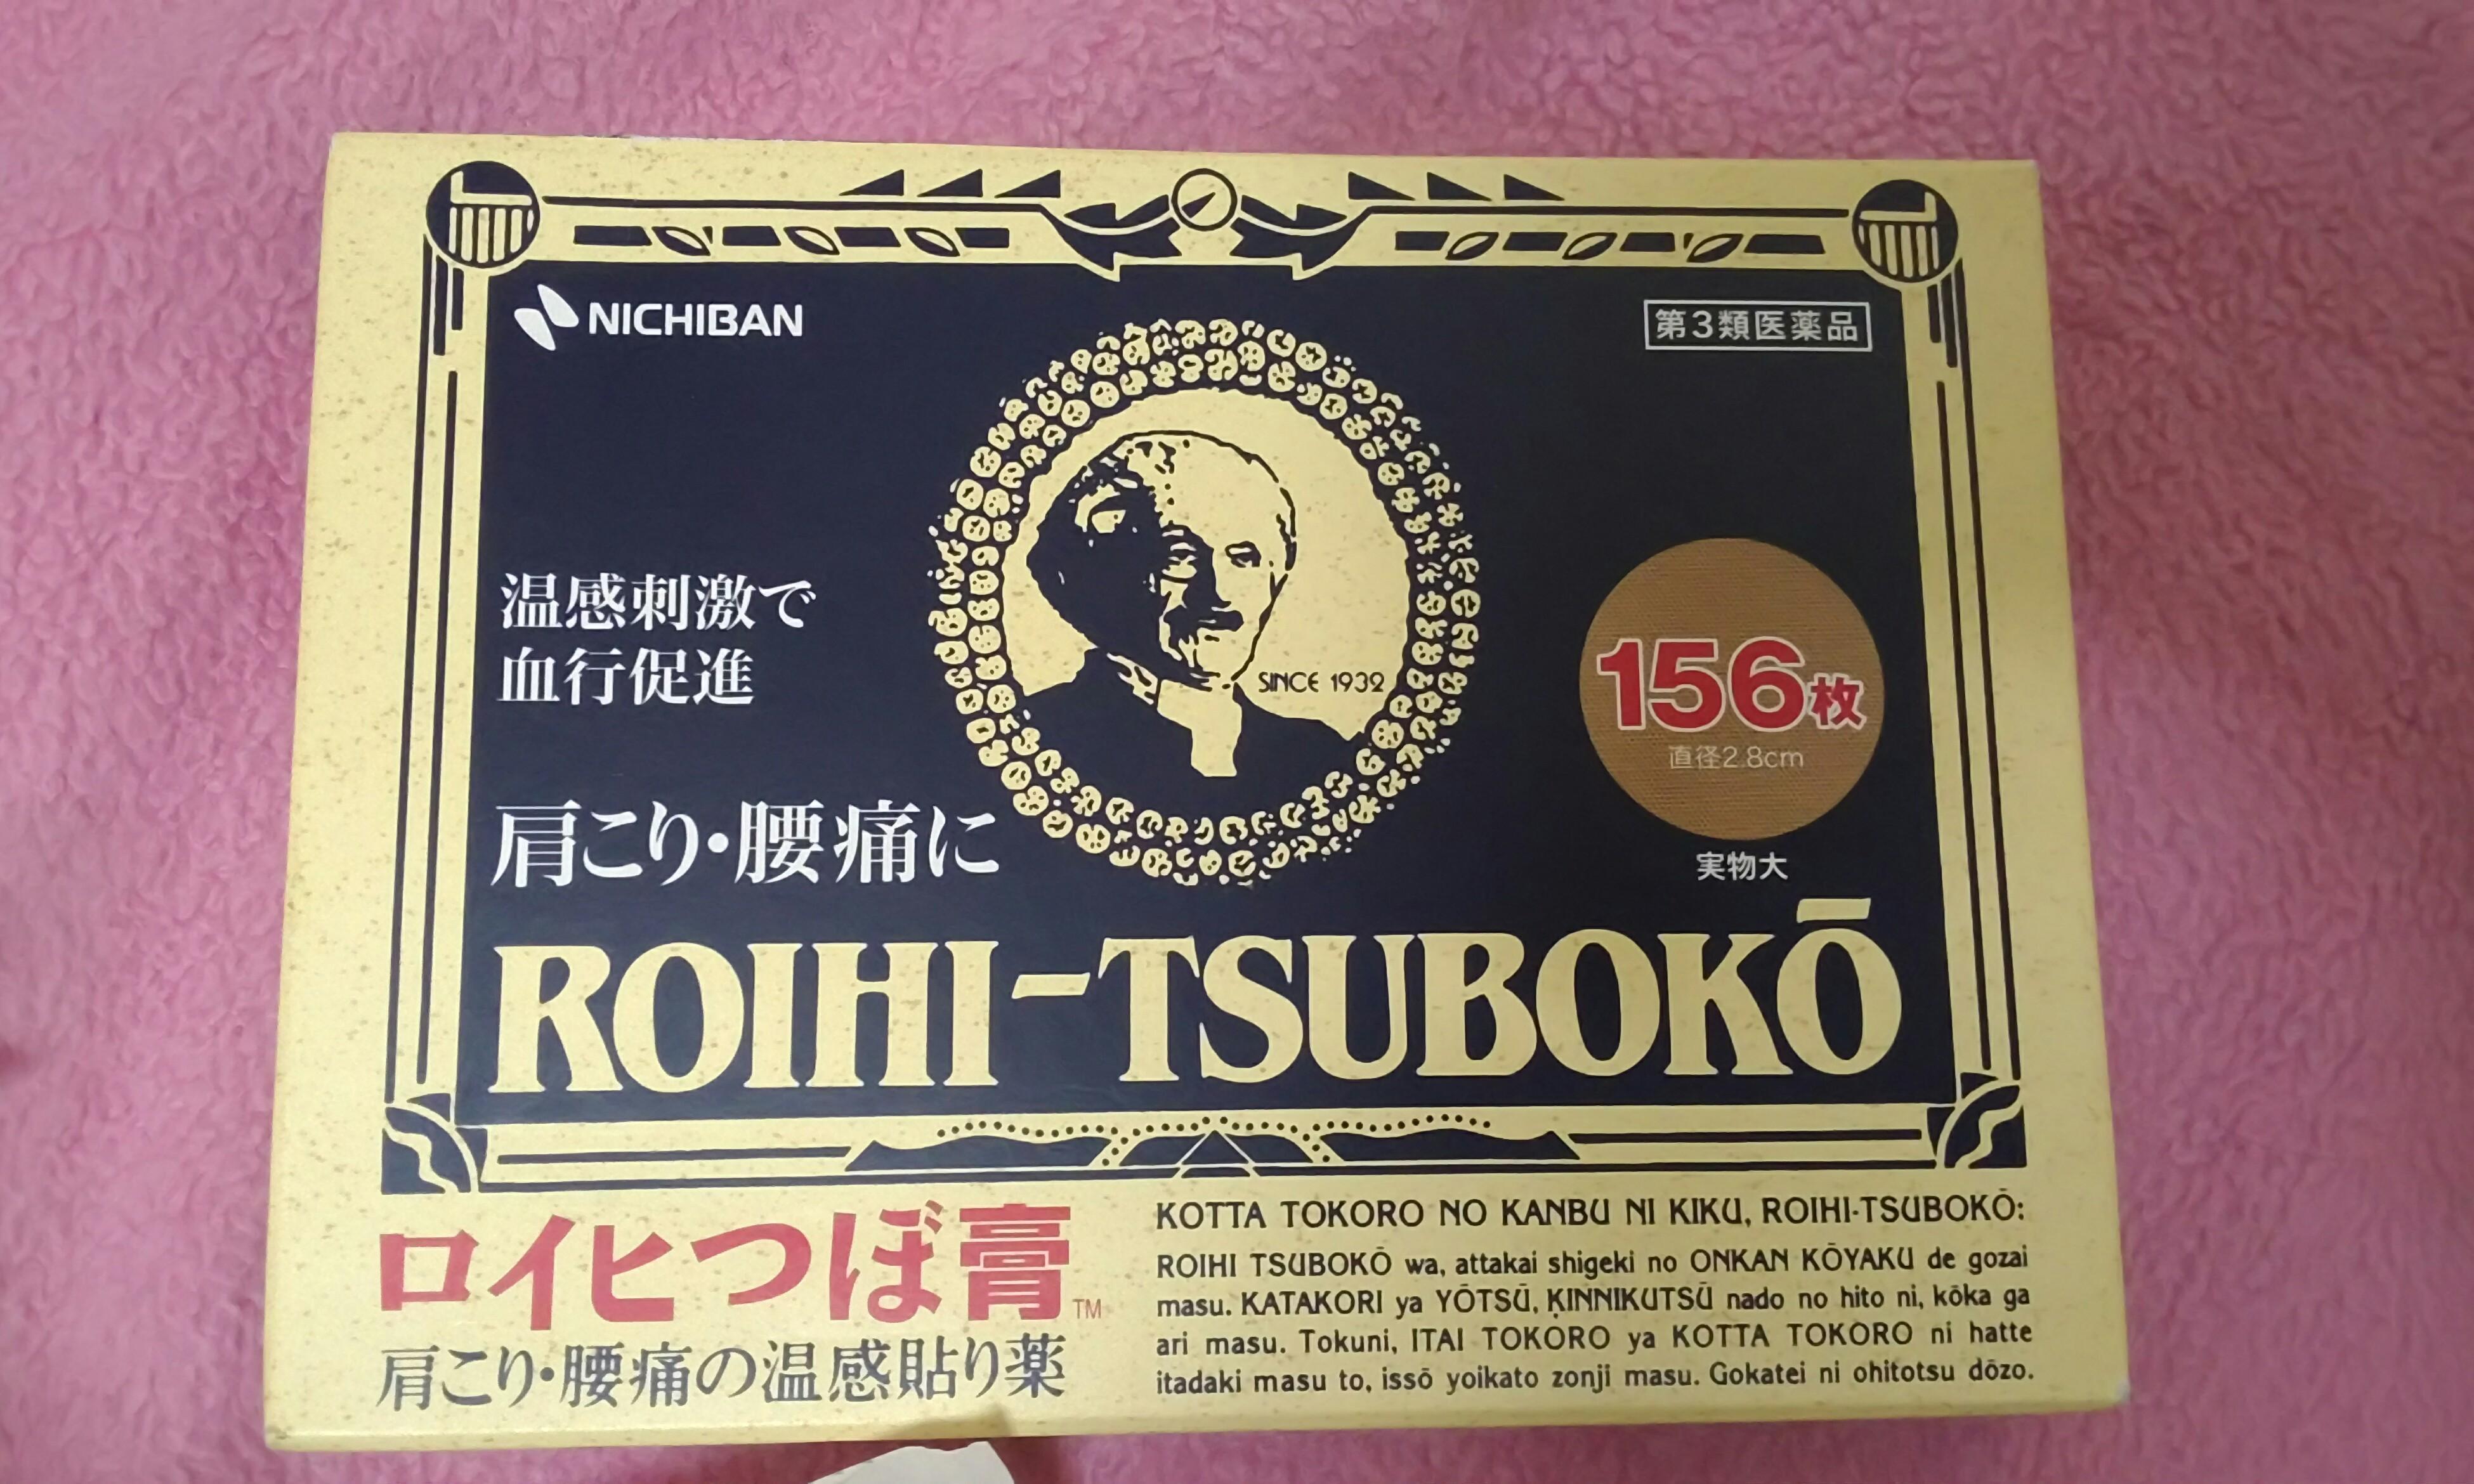 NICHIBAN。酸痛貼布。溫熱感。日本製